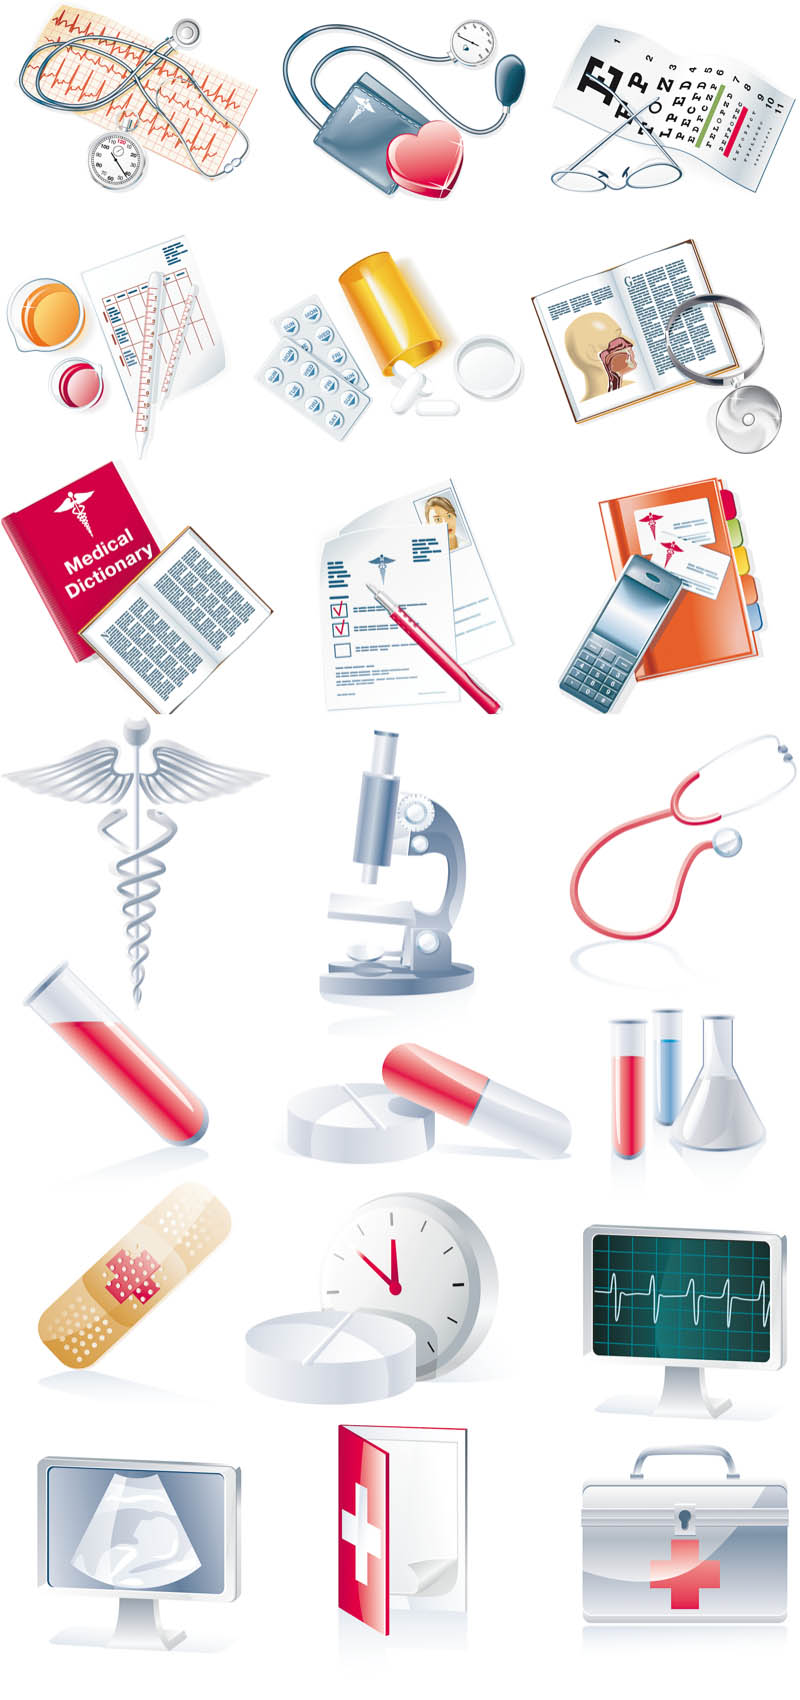 Medical Clip Art Free Downloads-medical clip art free downloads-11